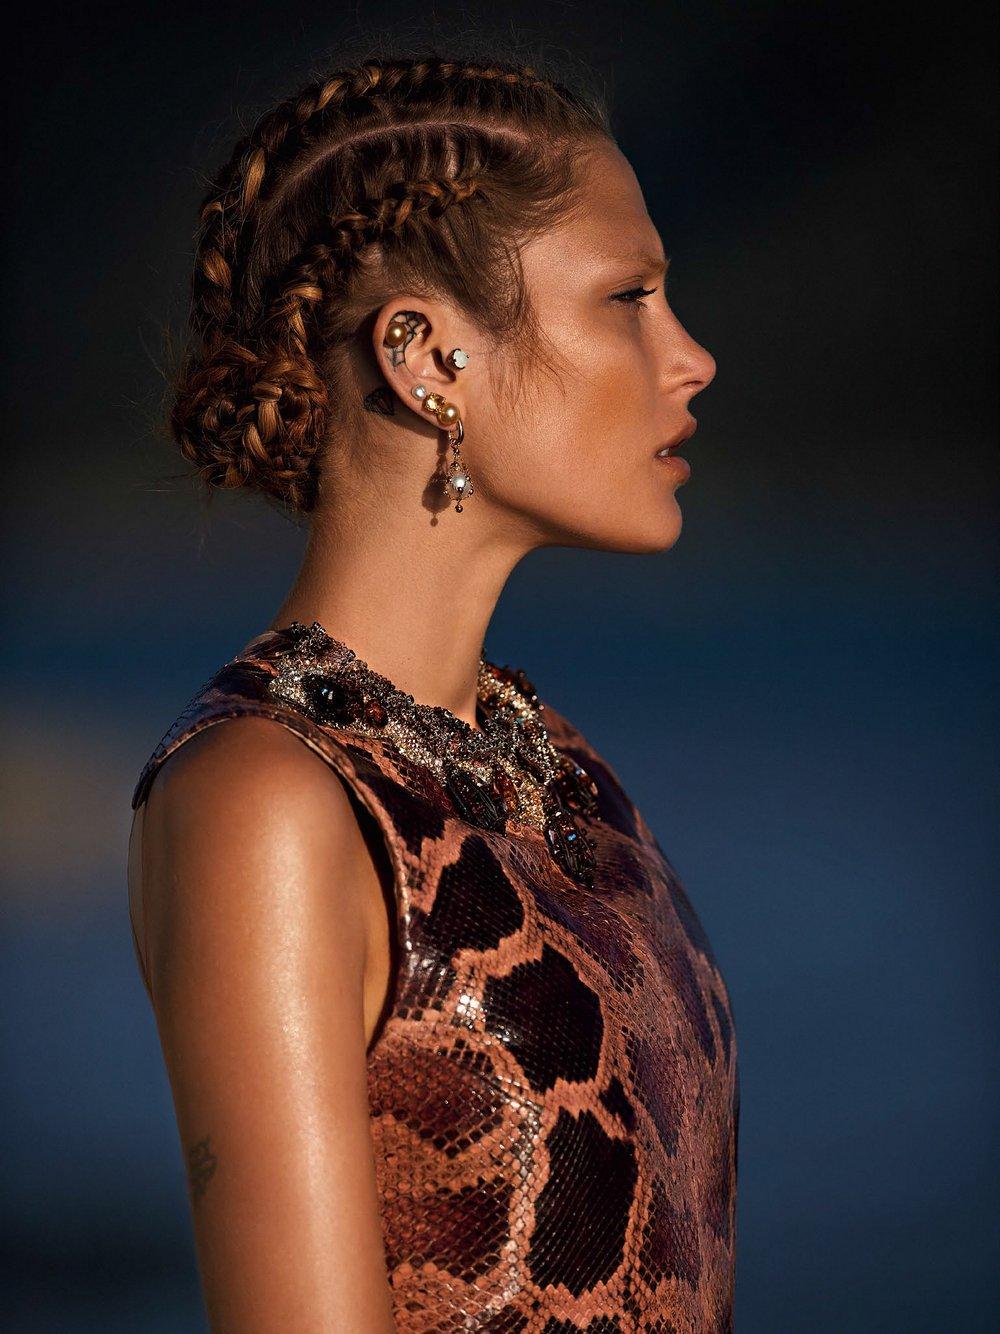 Catherine-McNeil-by-Gilles-Bensimon-for-Vogue-Australia-October-2014-5.jpg